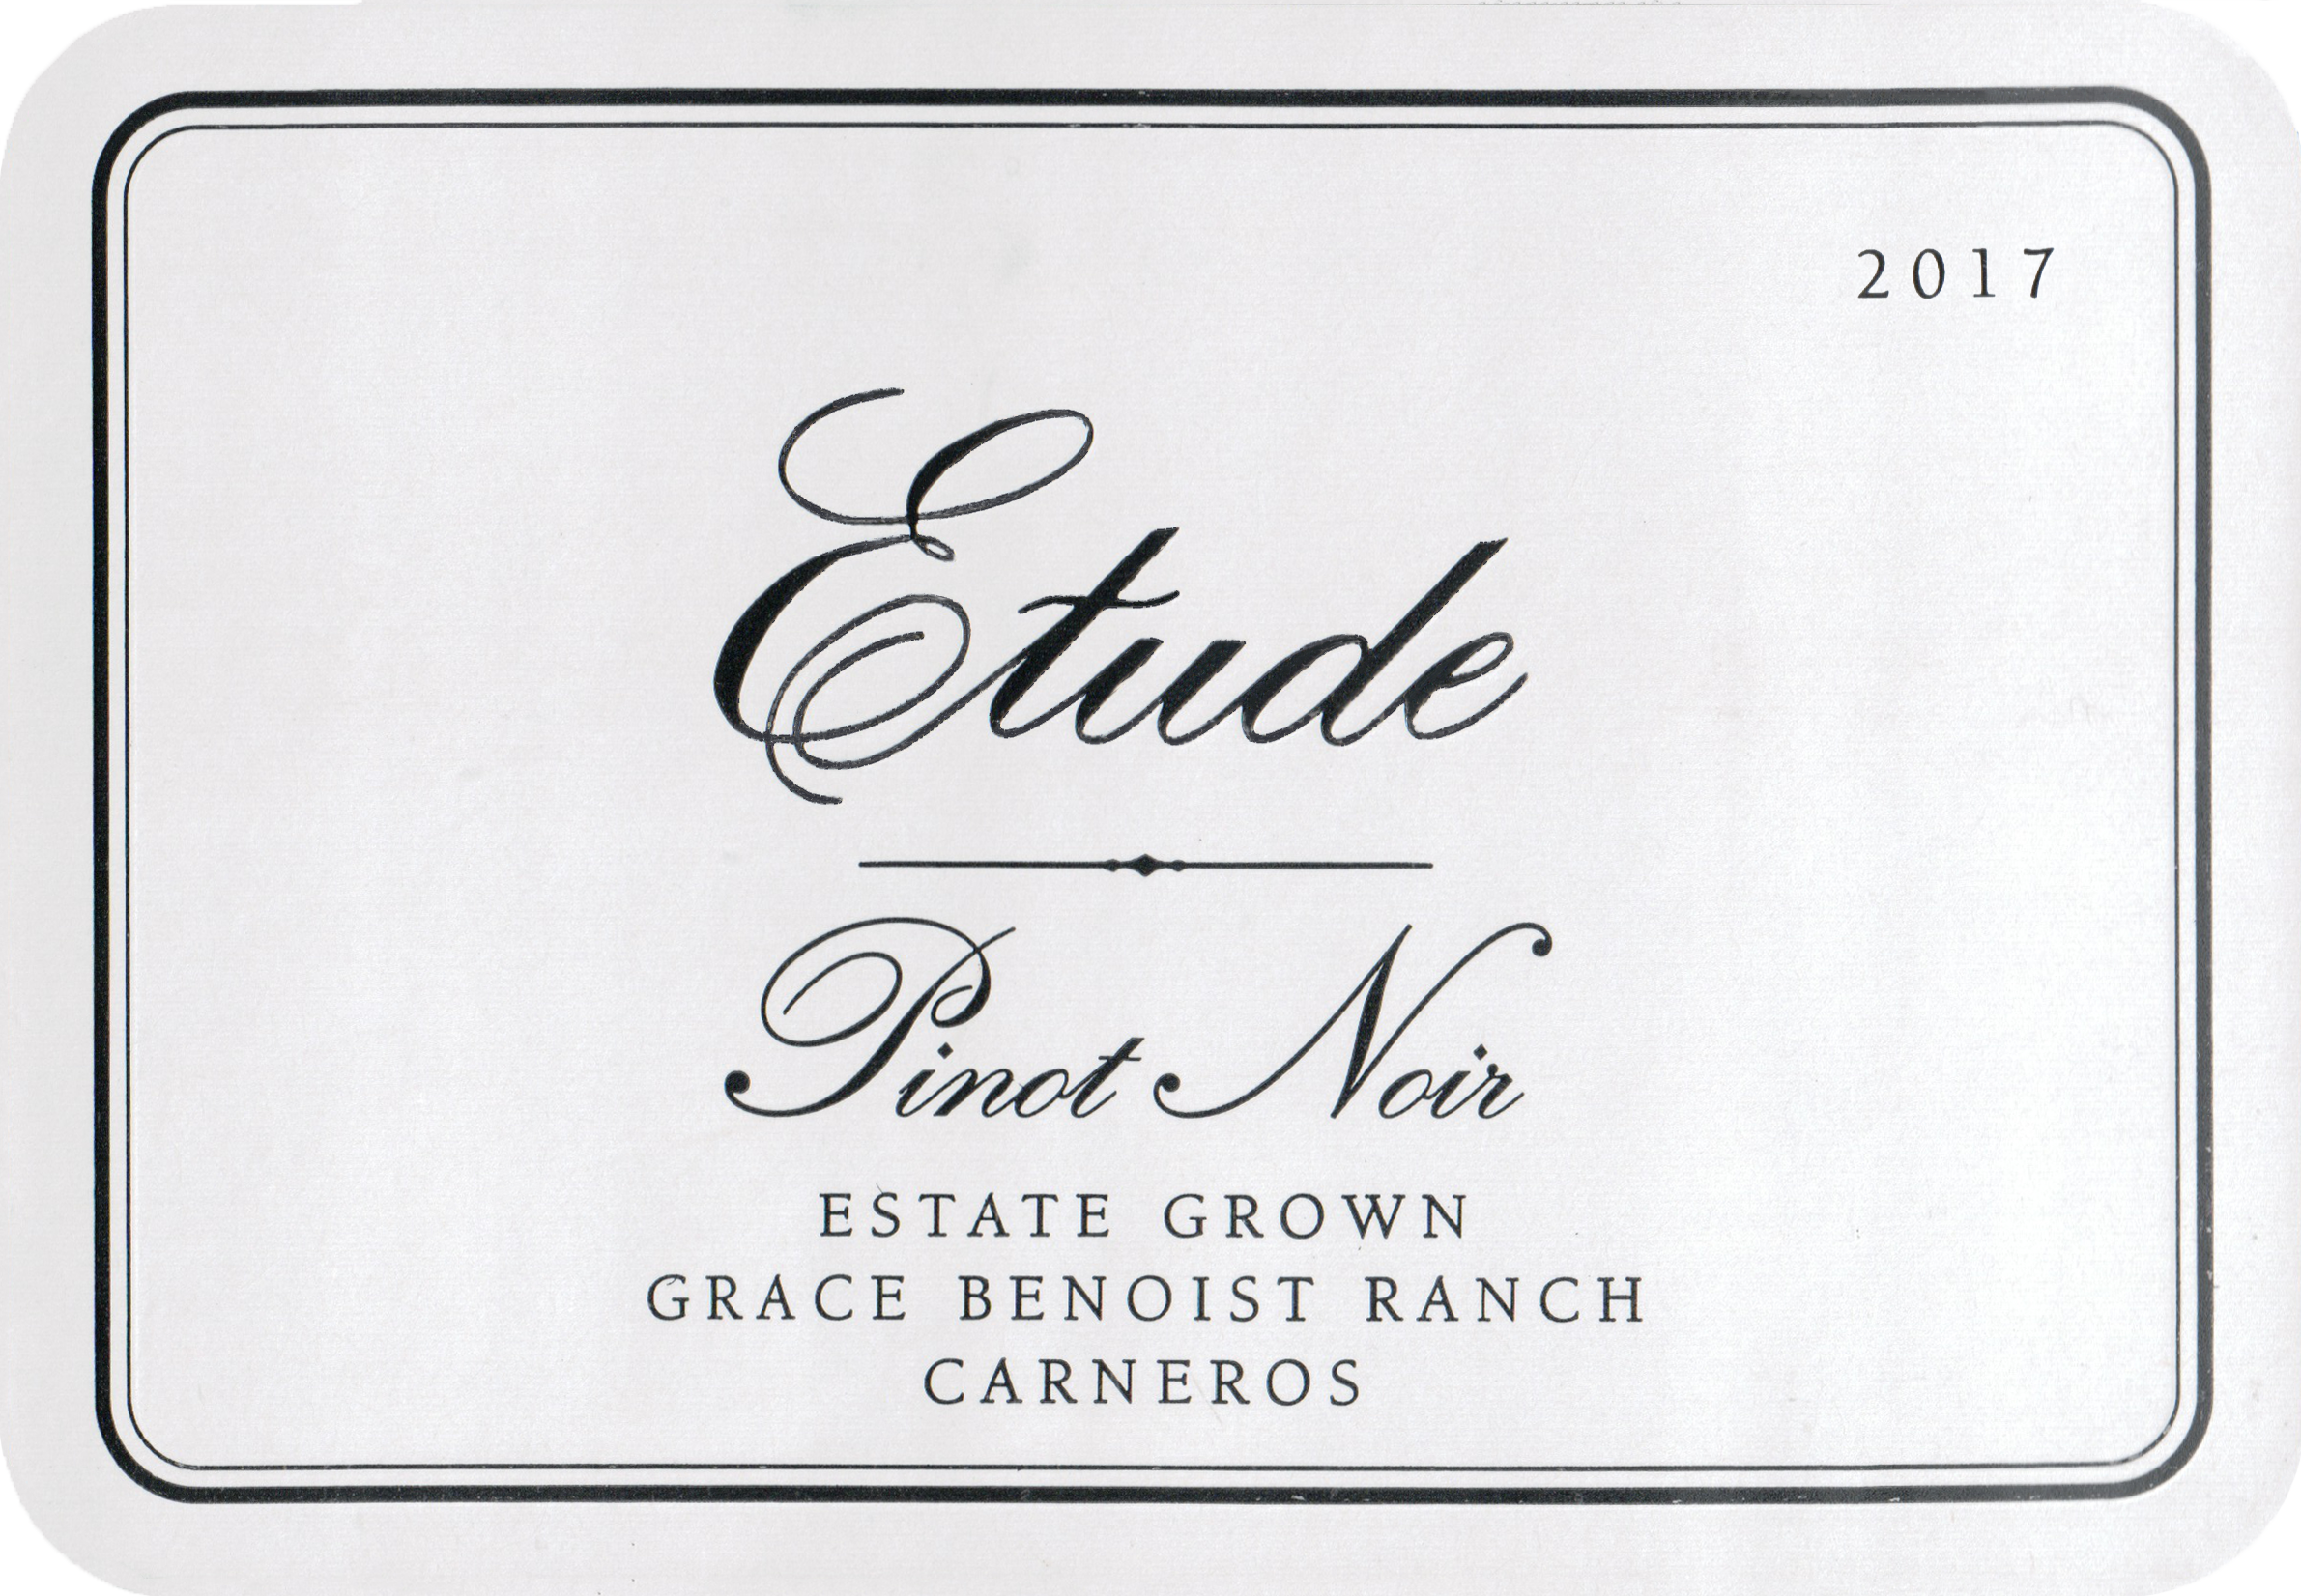 Etude Pinot Noir Carneros 2017